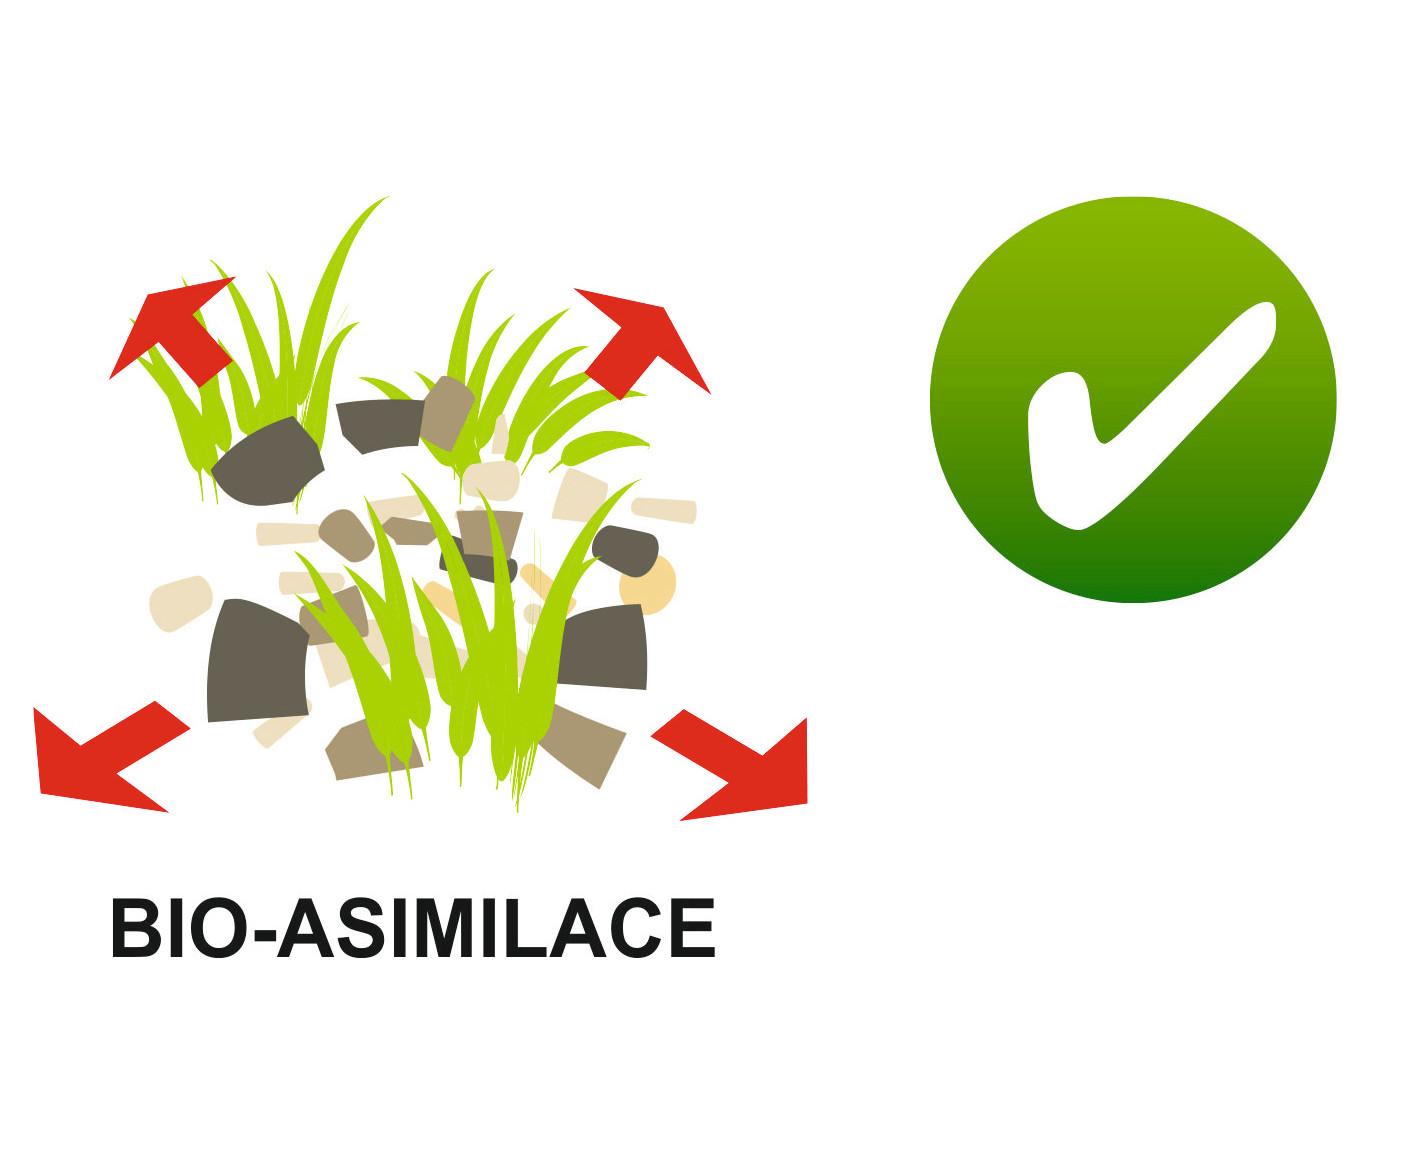 Bio-asimilace